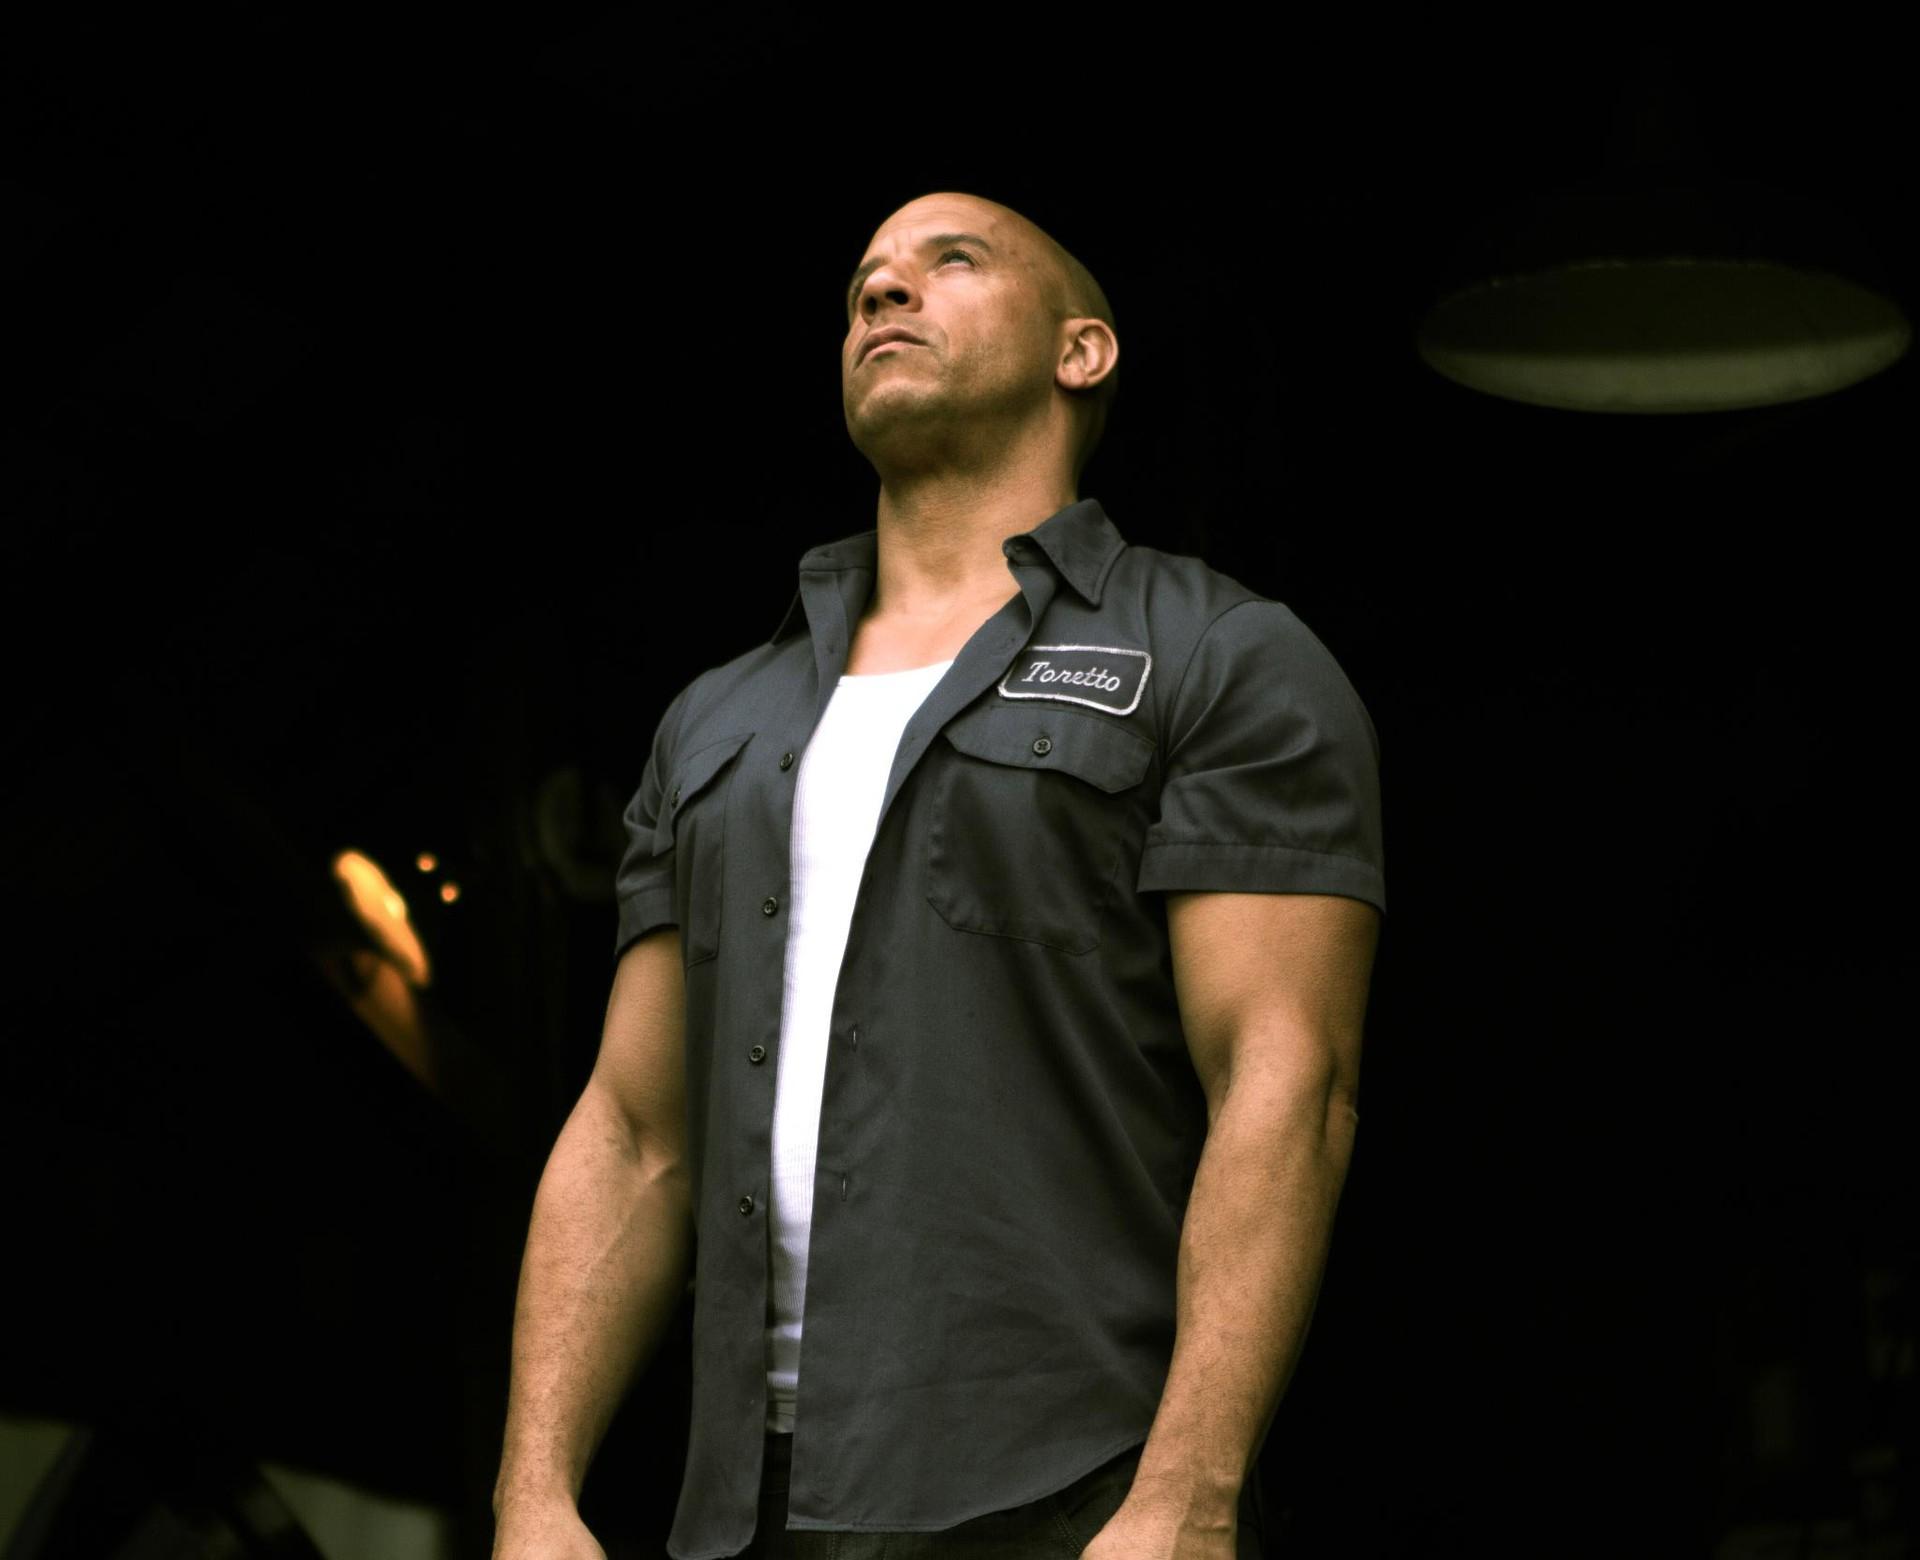 Vin Diesel as Dom Toretto in Furious 7